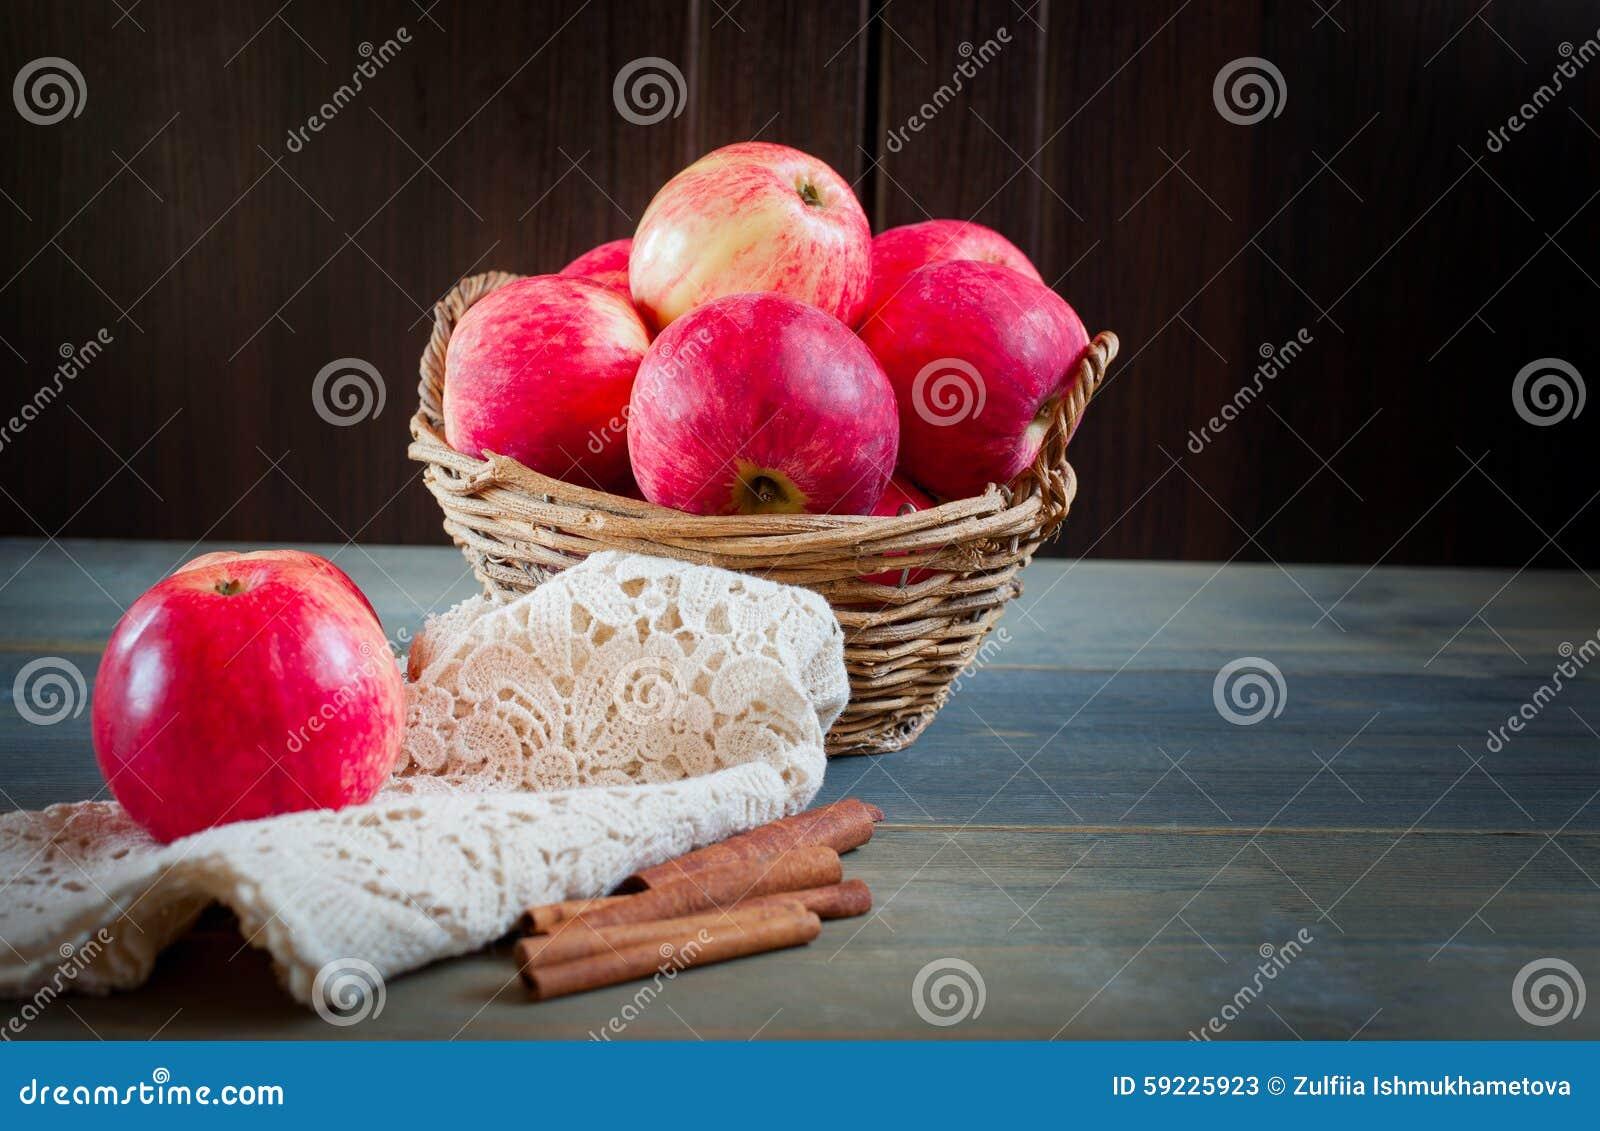 Sweet apples in the basket